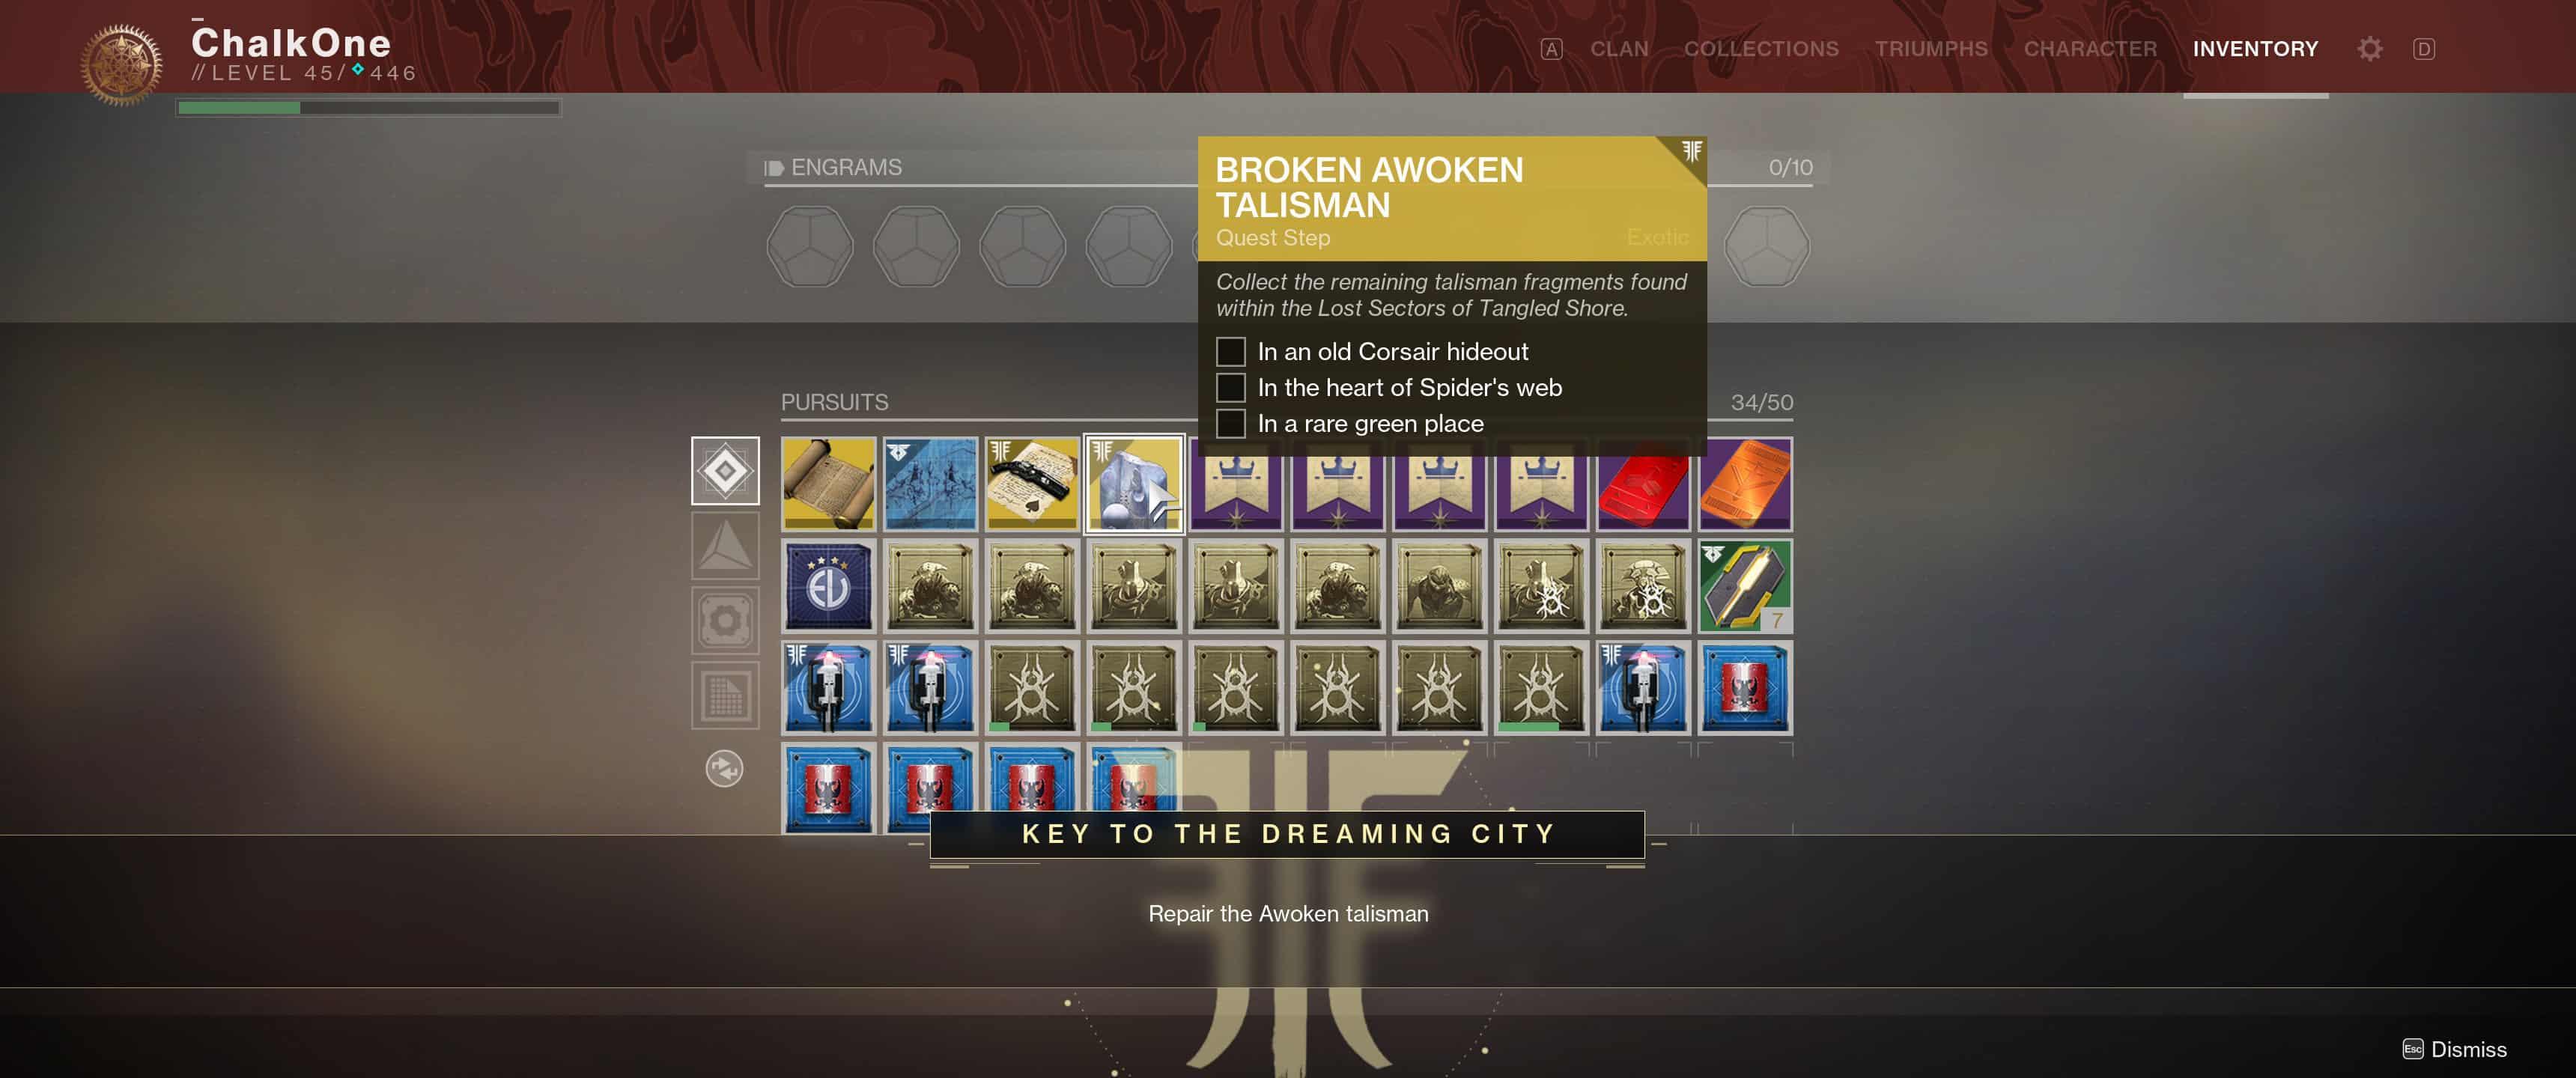 Repair the Broken Awoken Talisman & Unlock the Dreaming City